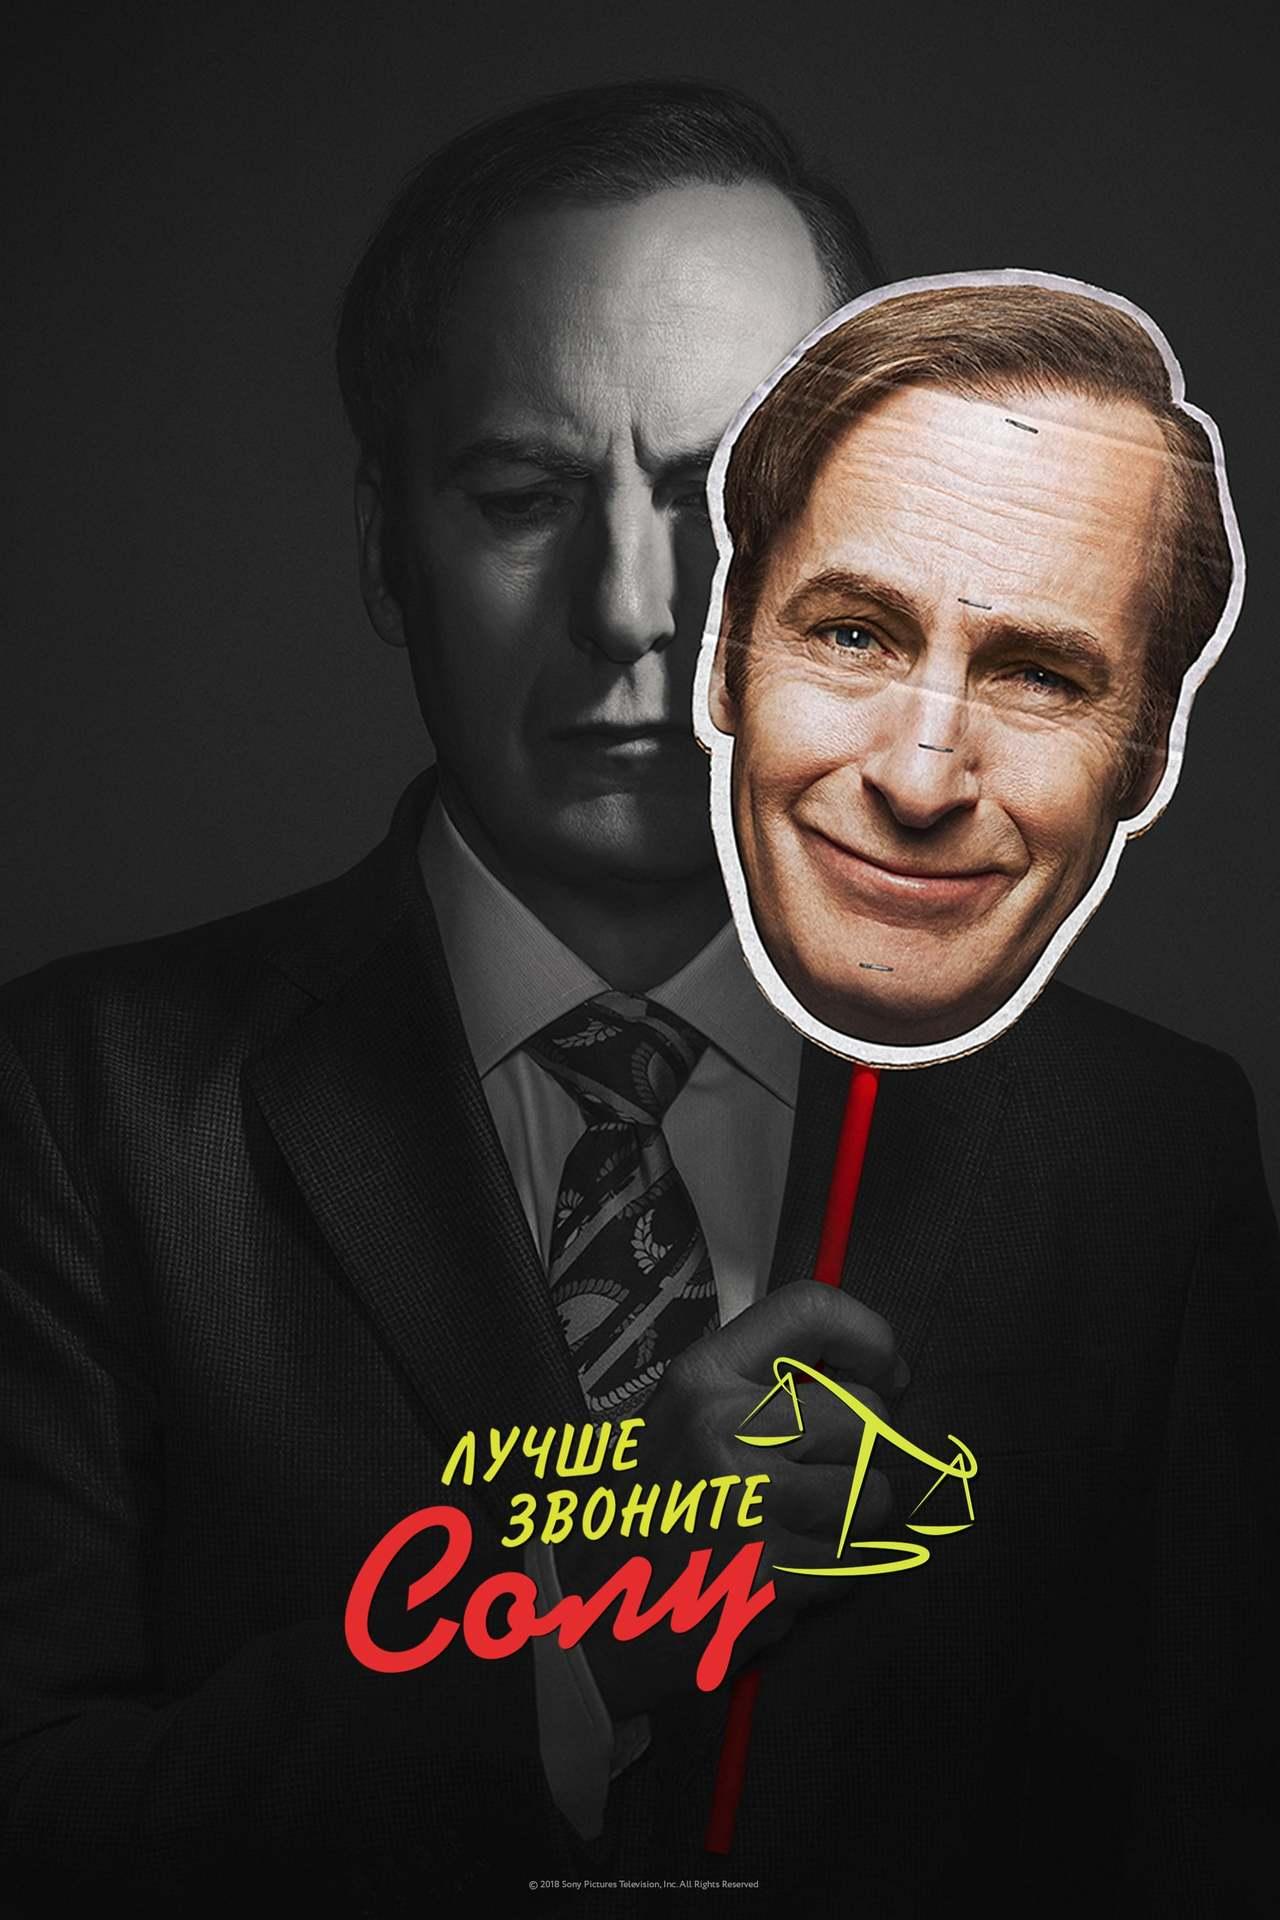 Постер фильма Лучше звоните Солу Better Call Saul 2015